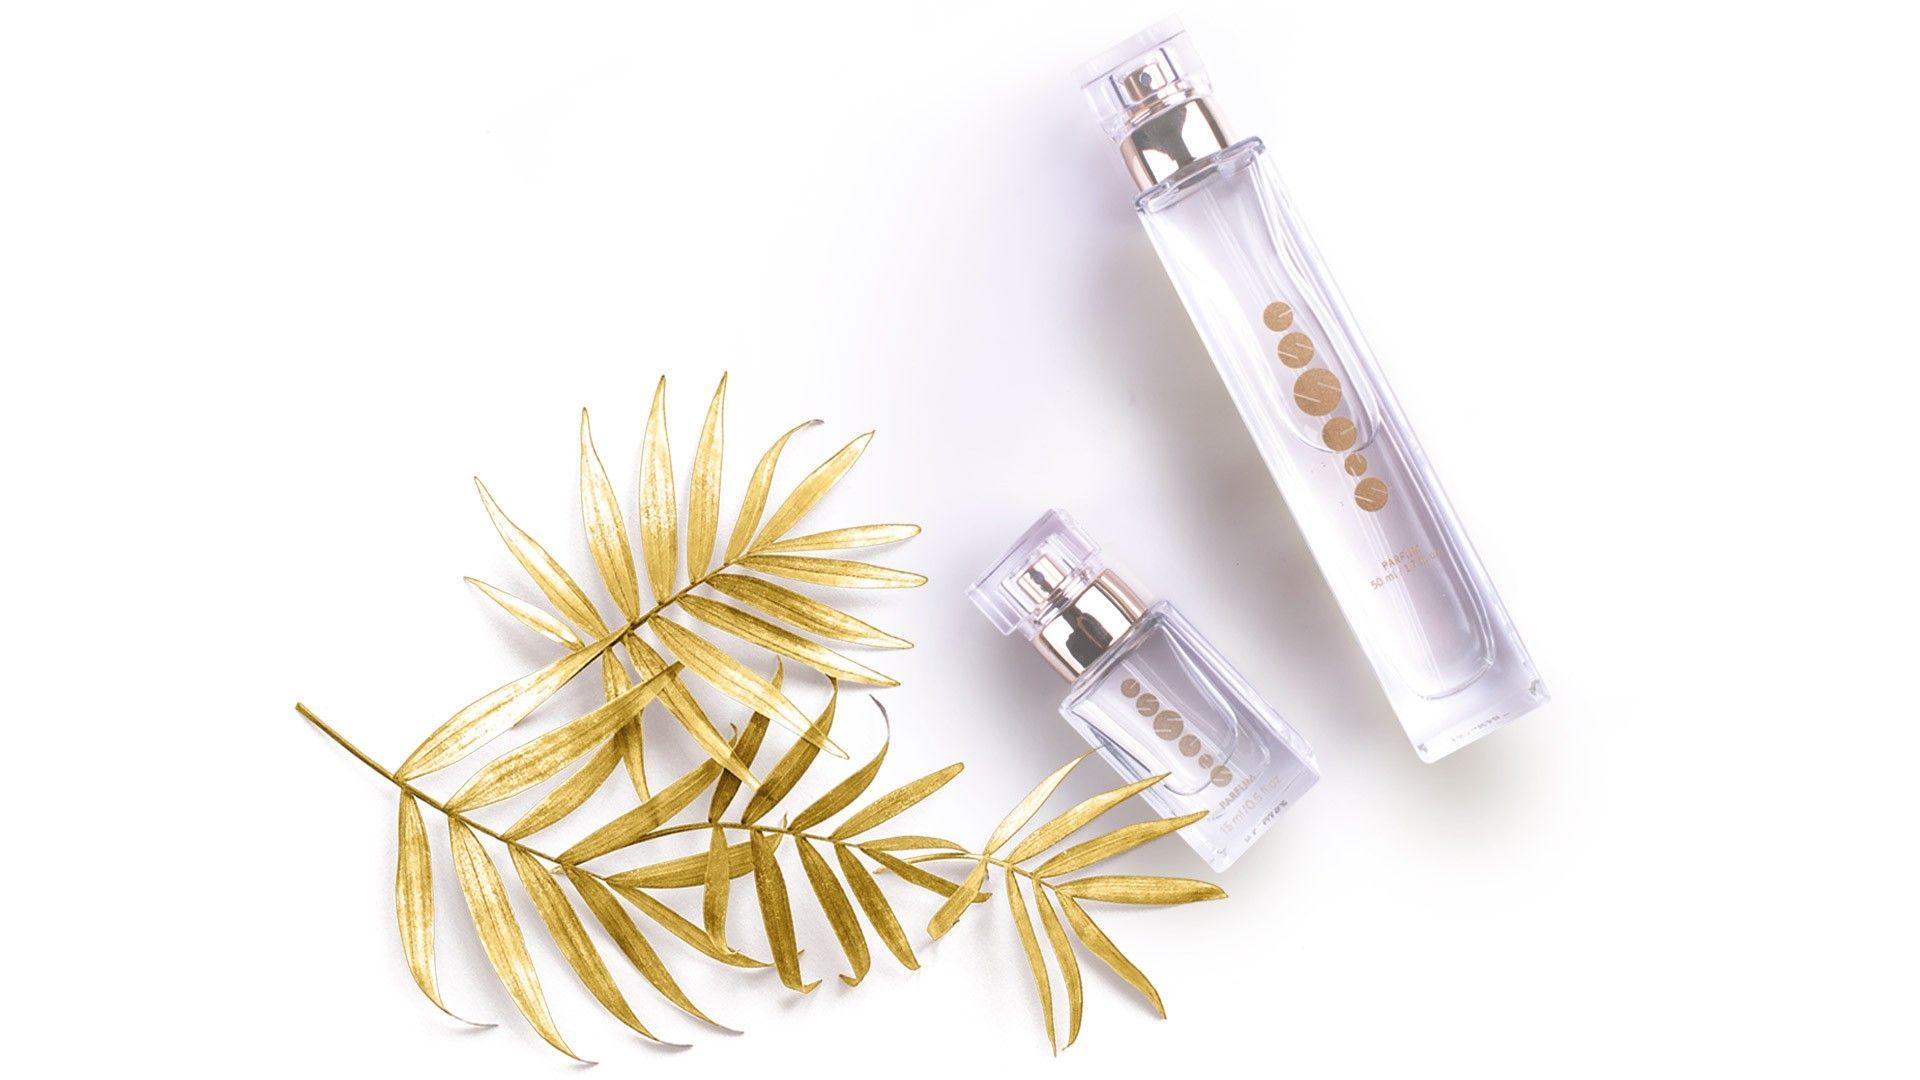 Essens perfumes designer inspired fragrances for less in